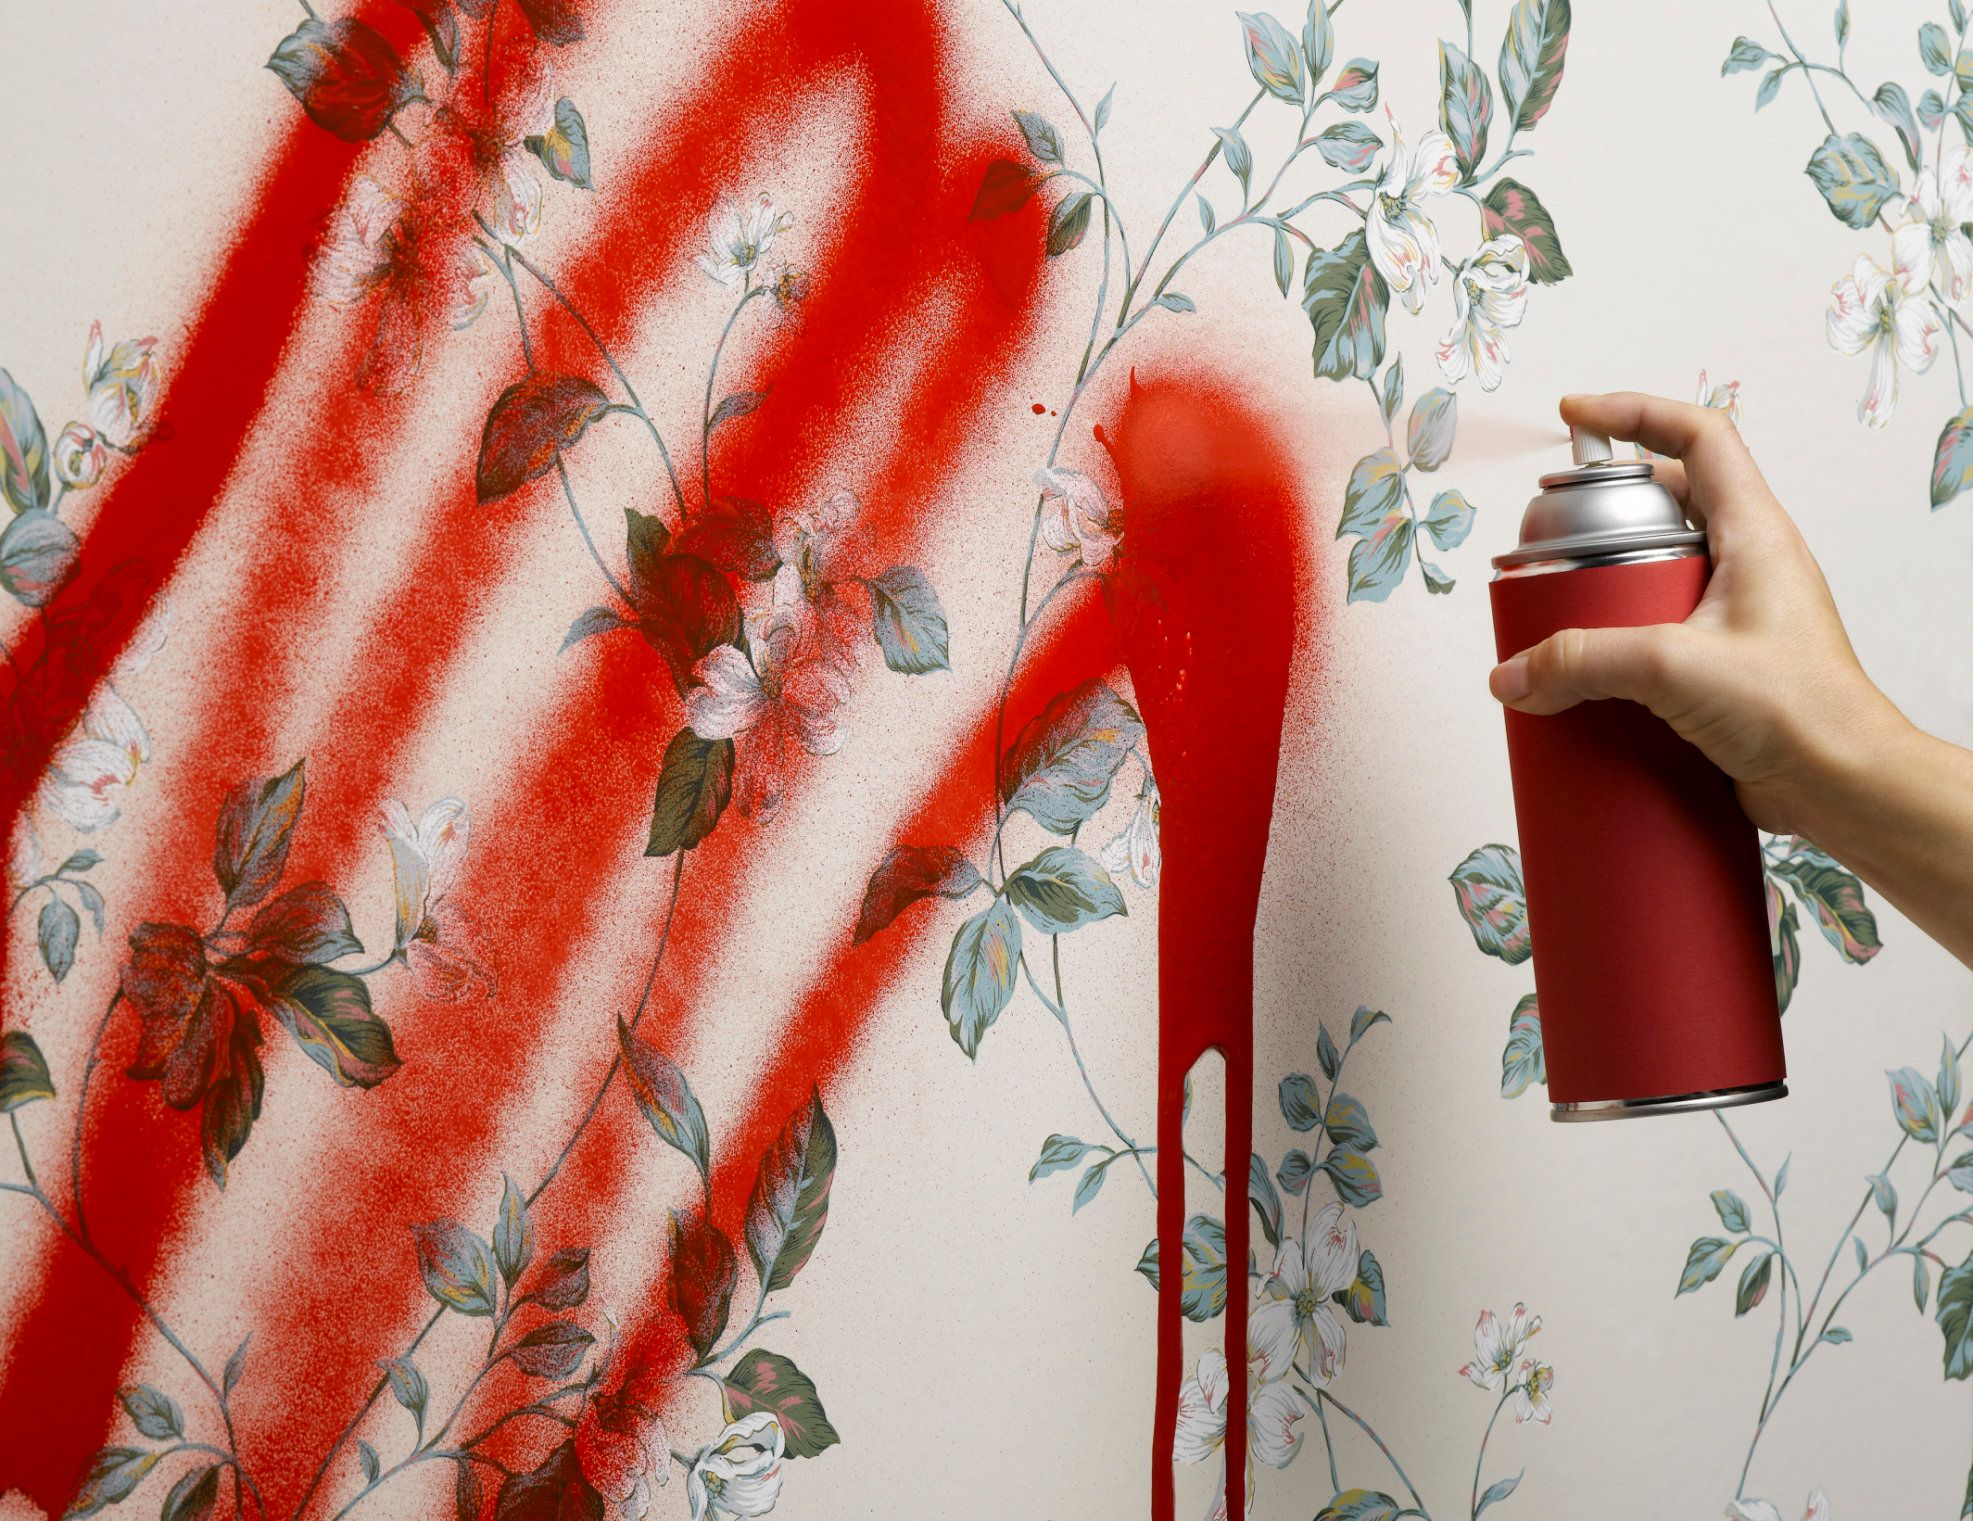 Someone spray painting wallpaper.